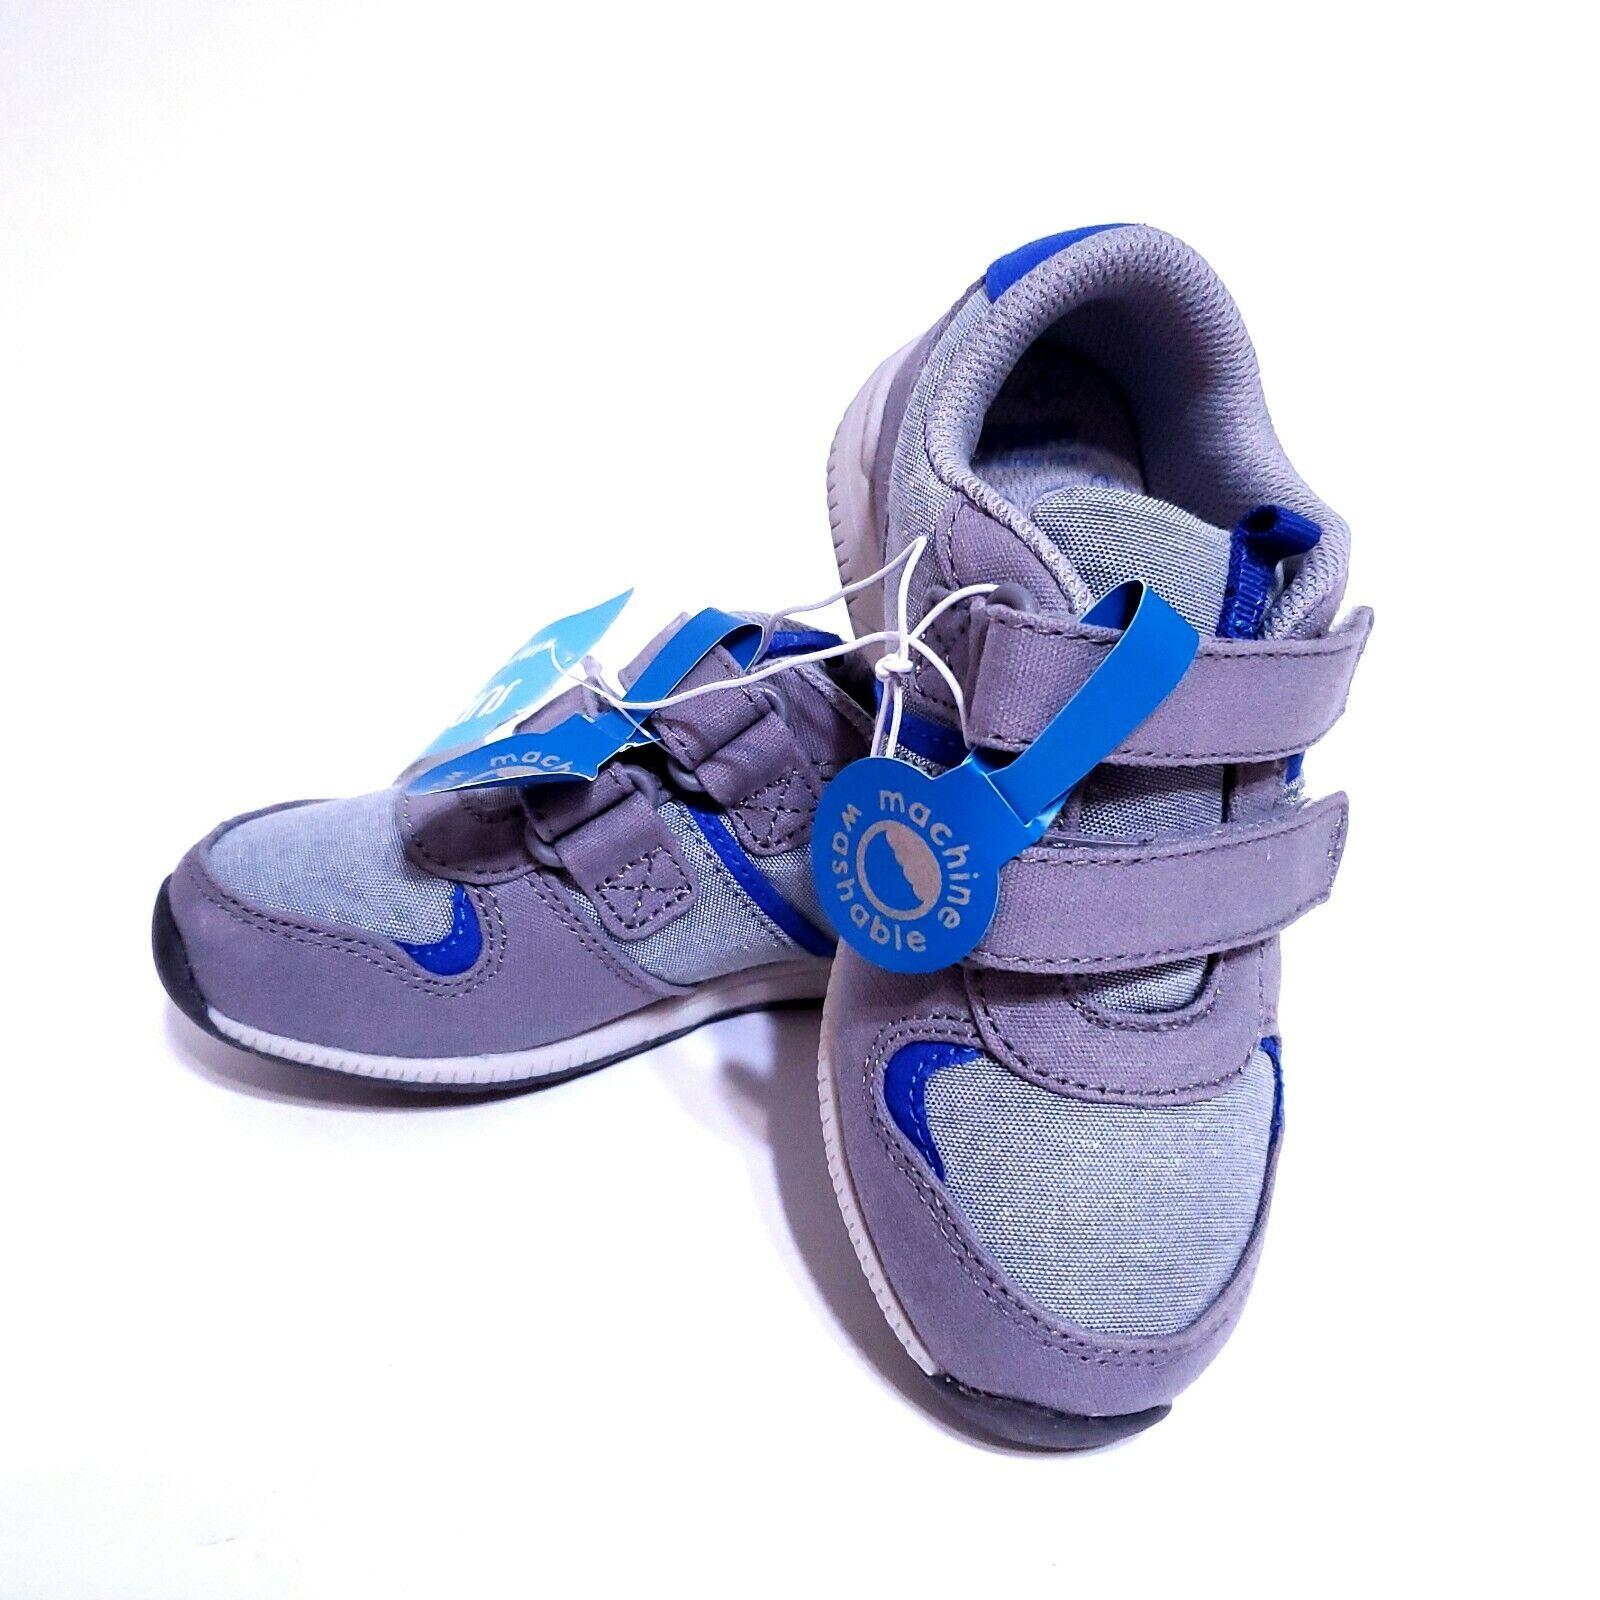 Toddler Boys' Surprize by Stride Rite Luke Sneakers - Gray -